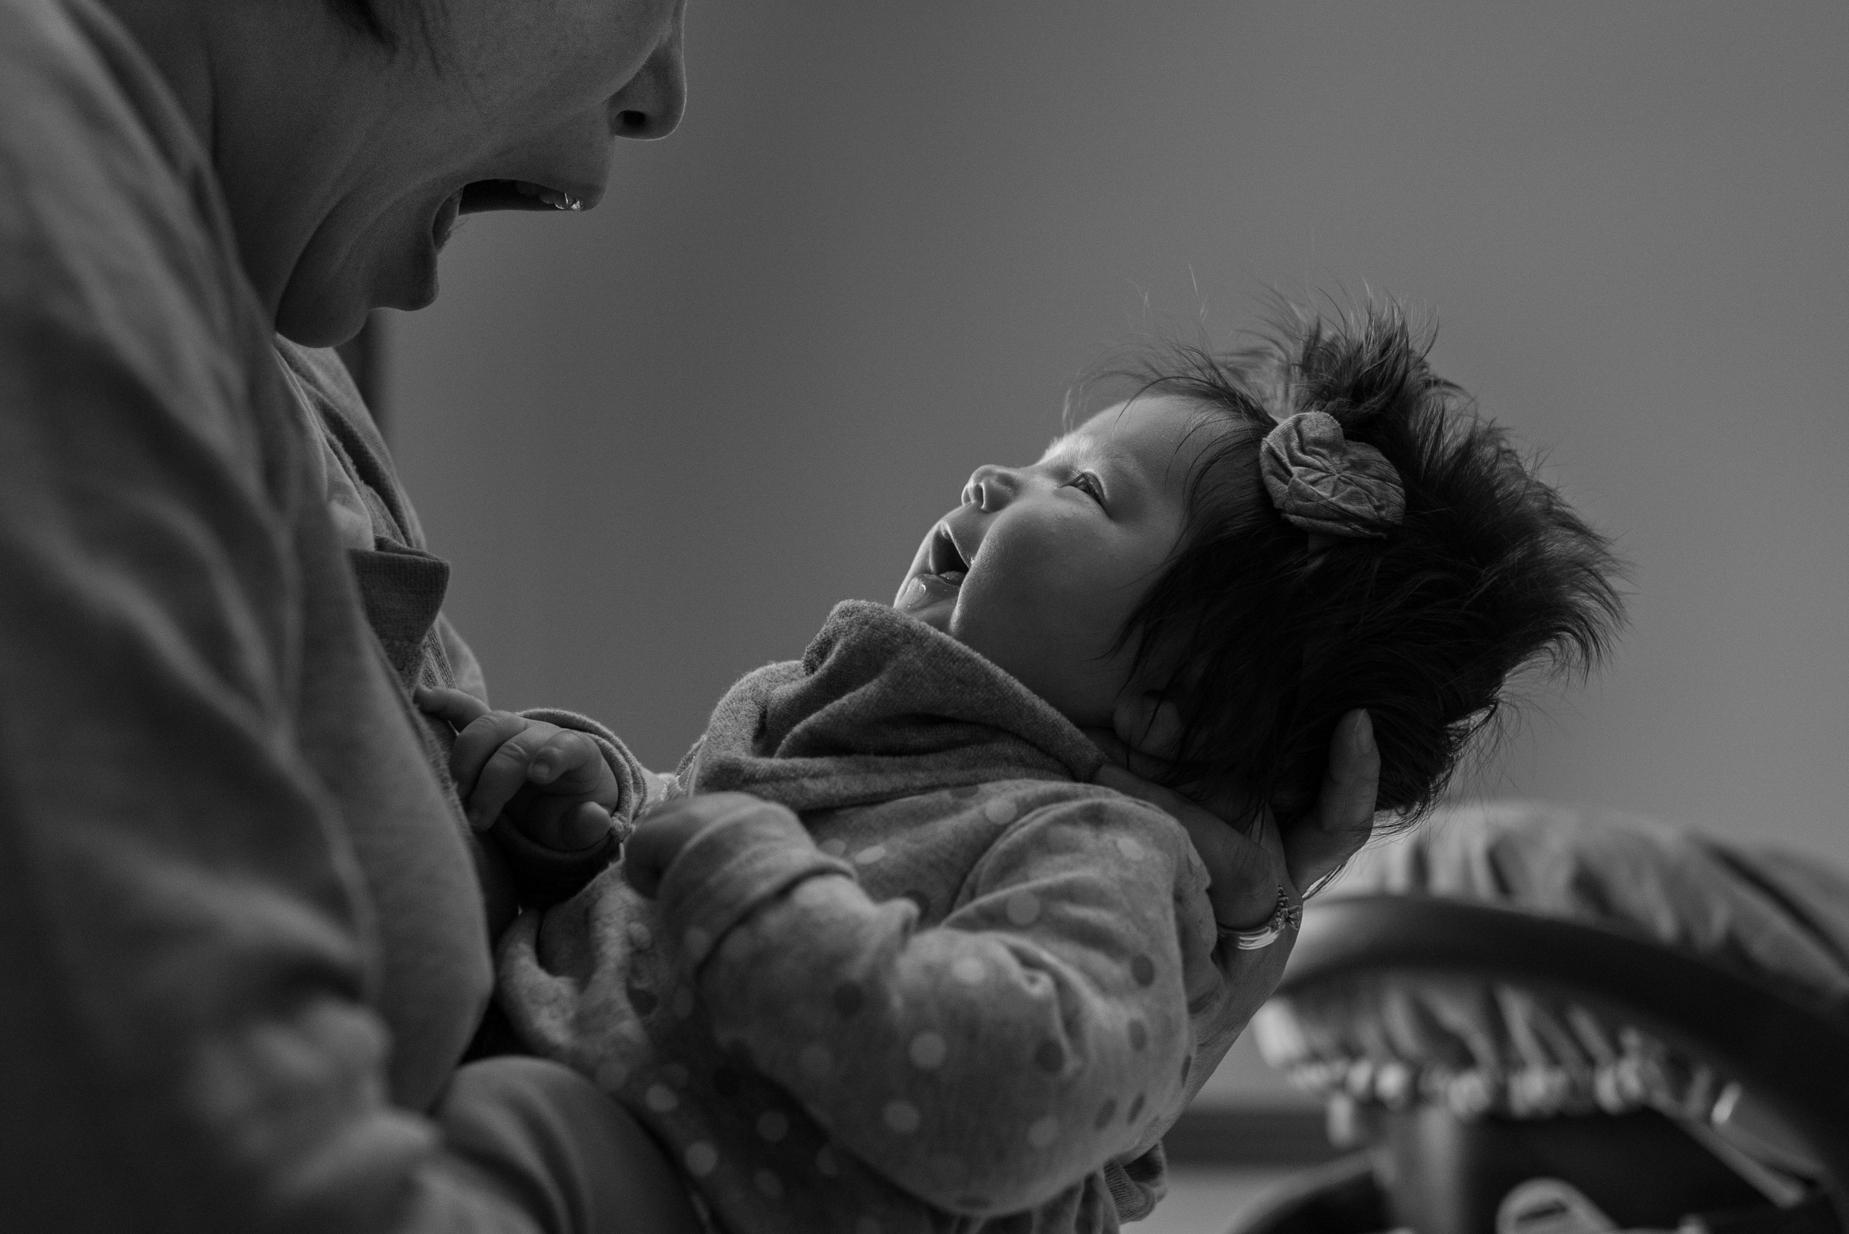 Kari Gierach Photography, Milwaukee Wisconsin documentary family photographer, Wauwatosa family photography, baby girl and grandma, granddaughter -1.jpg